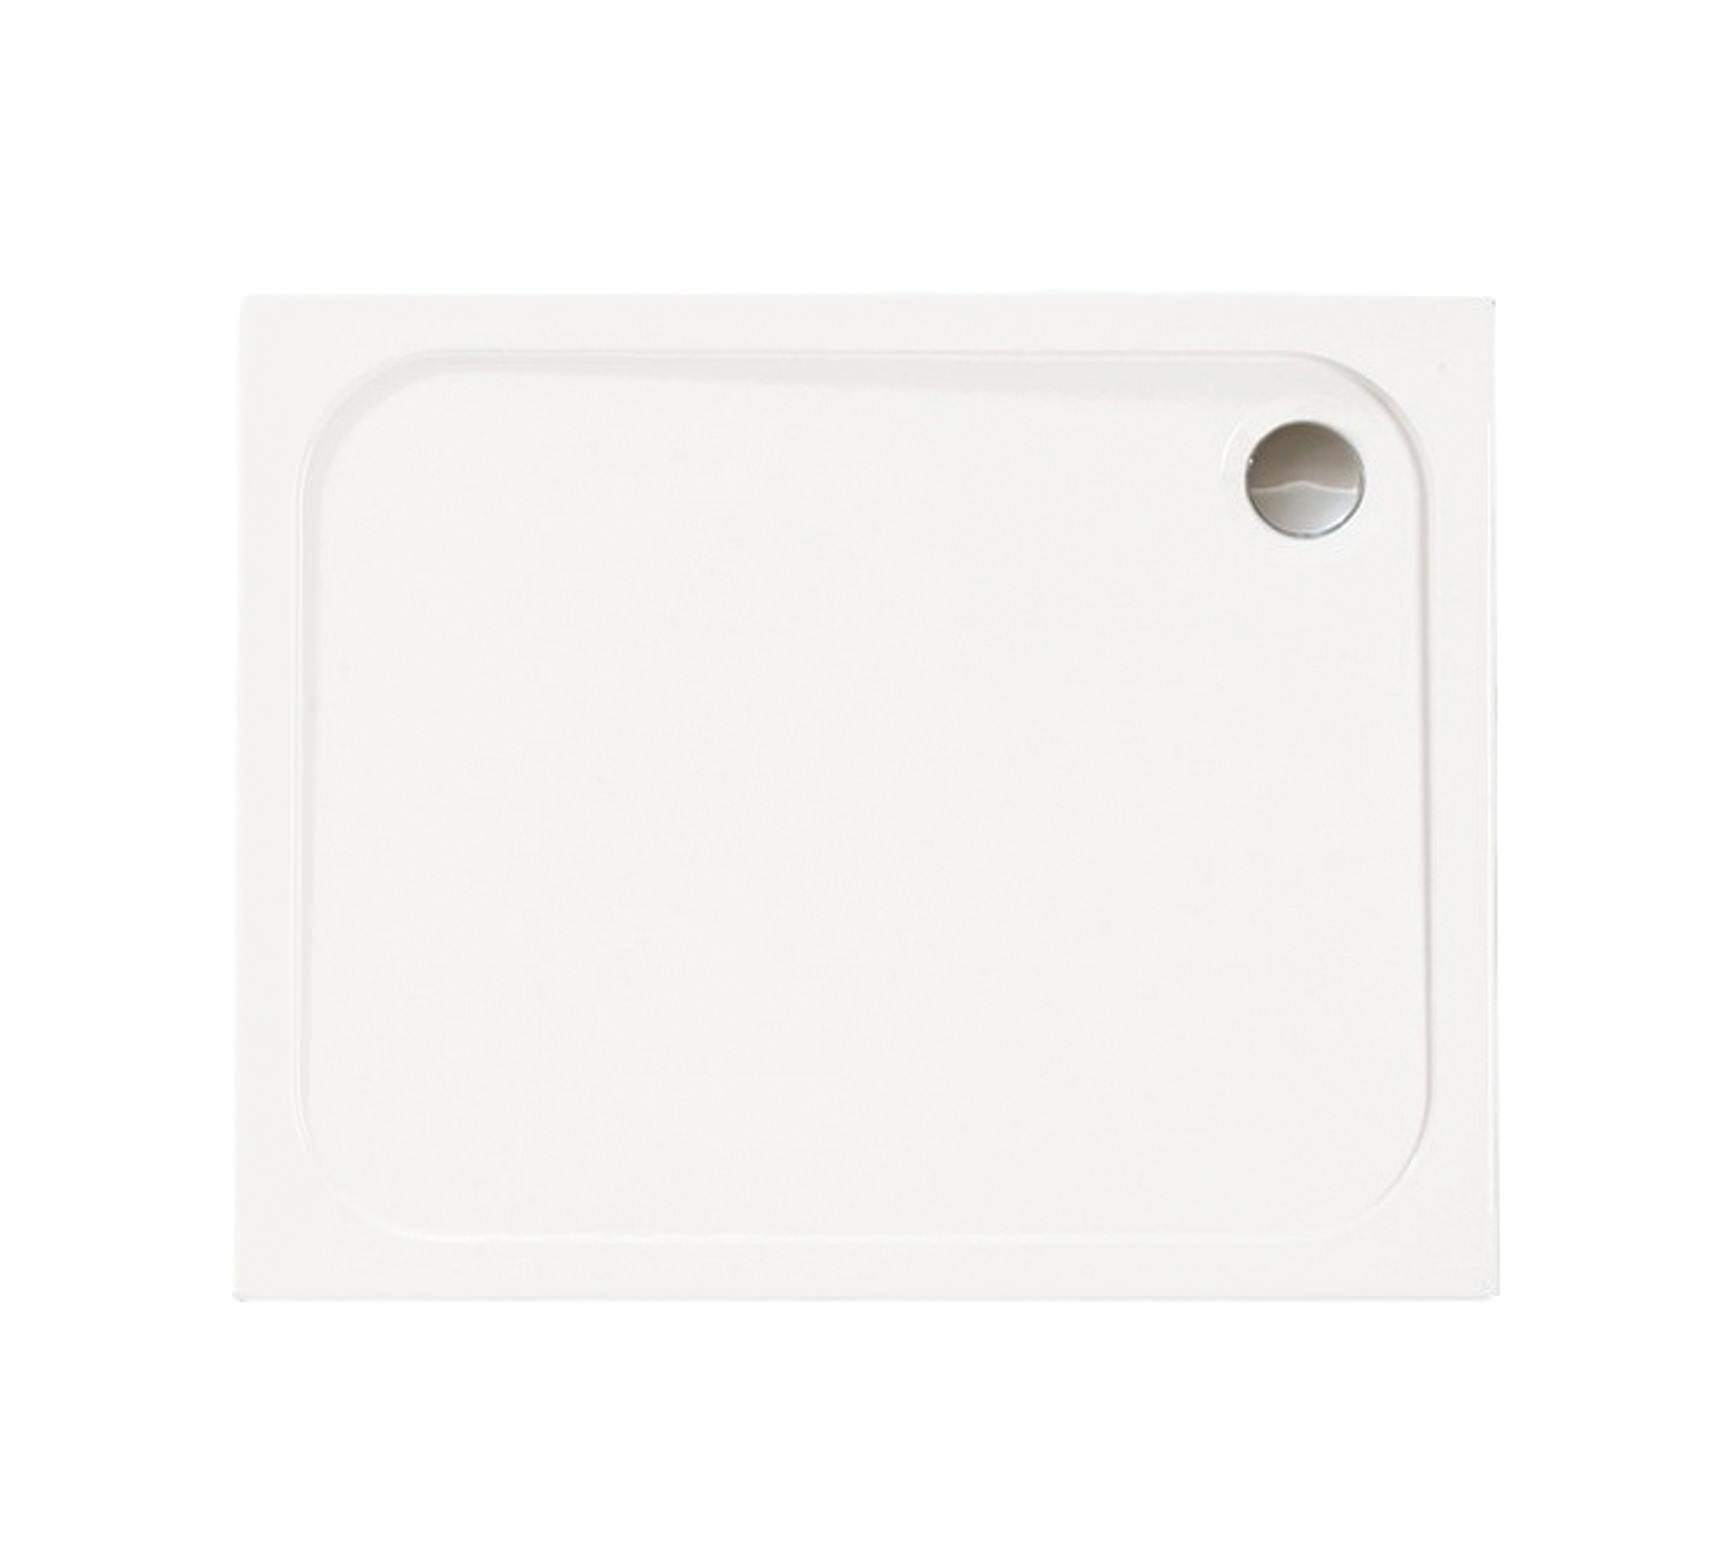 Merlyn Mstone Rectangular Shower Tray with waste 1500 x 900mm